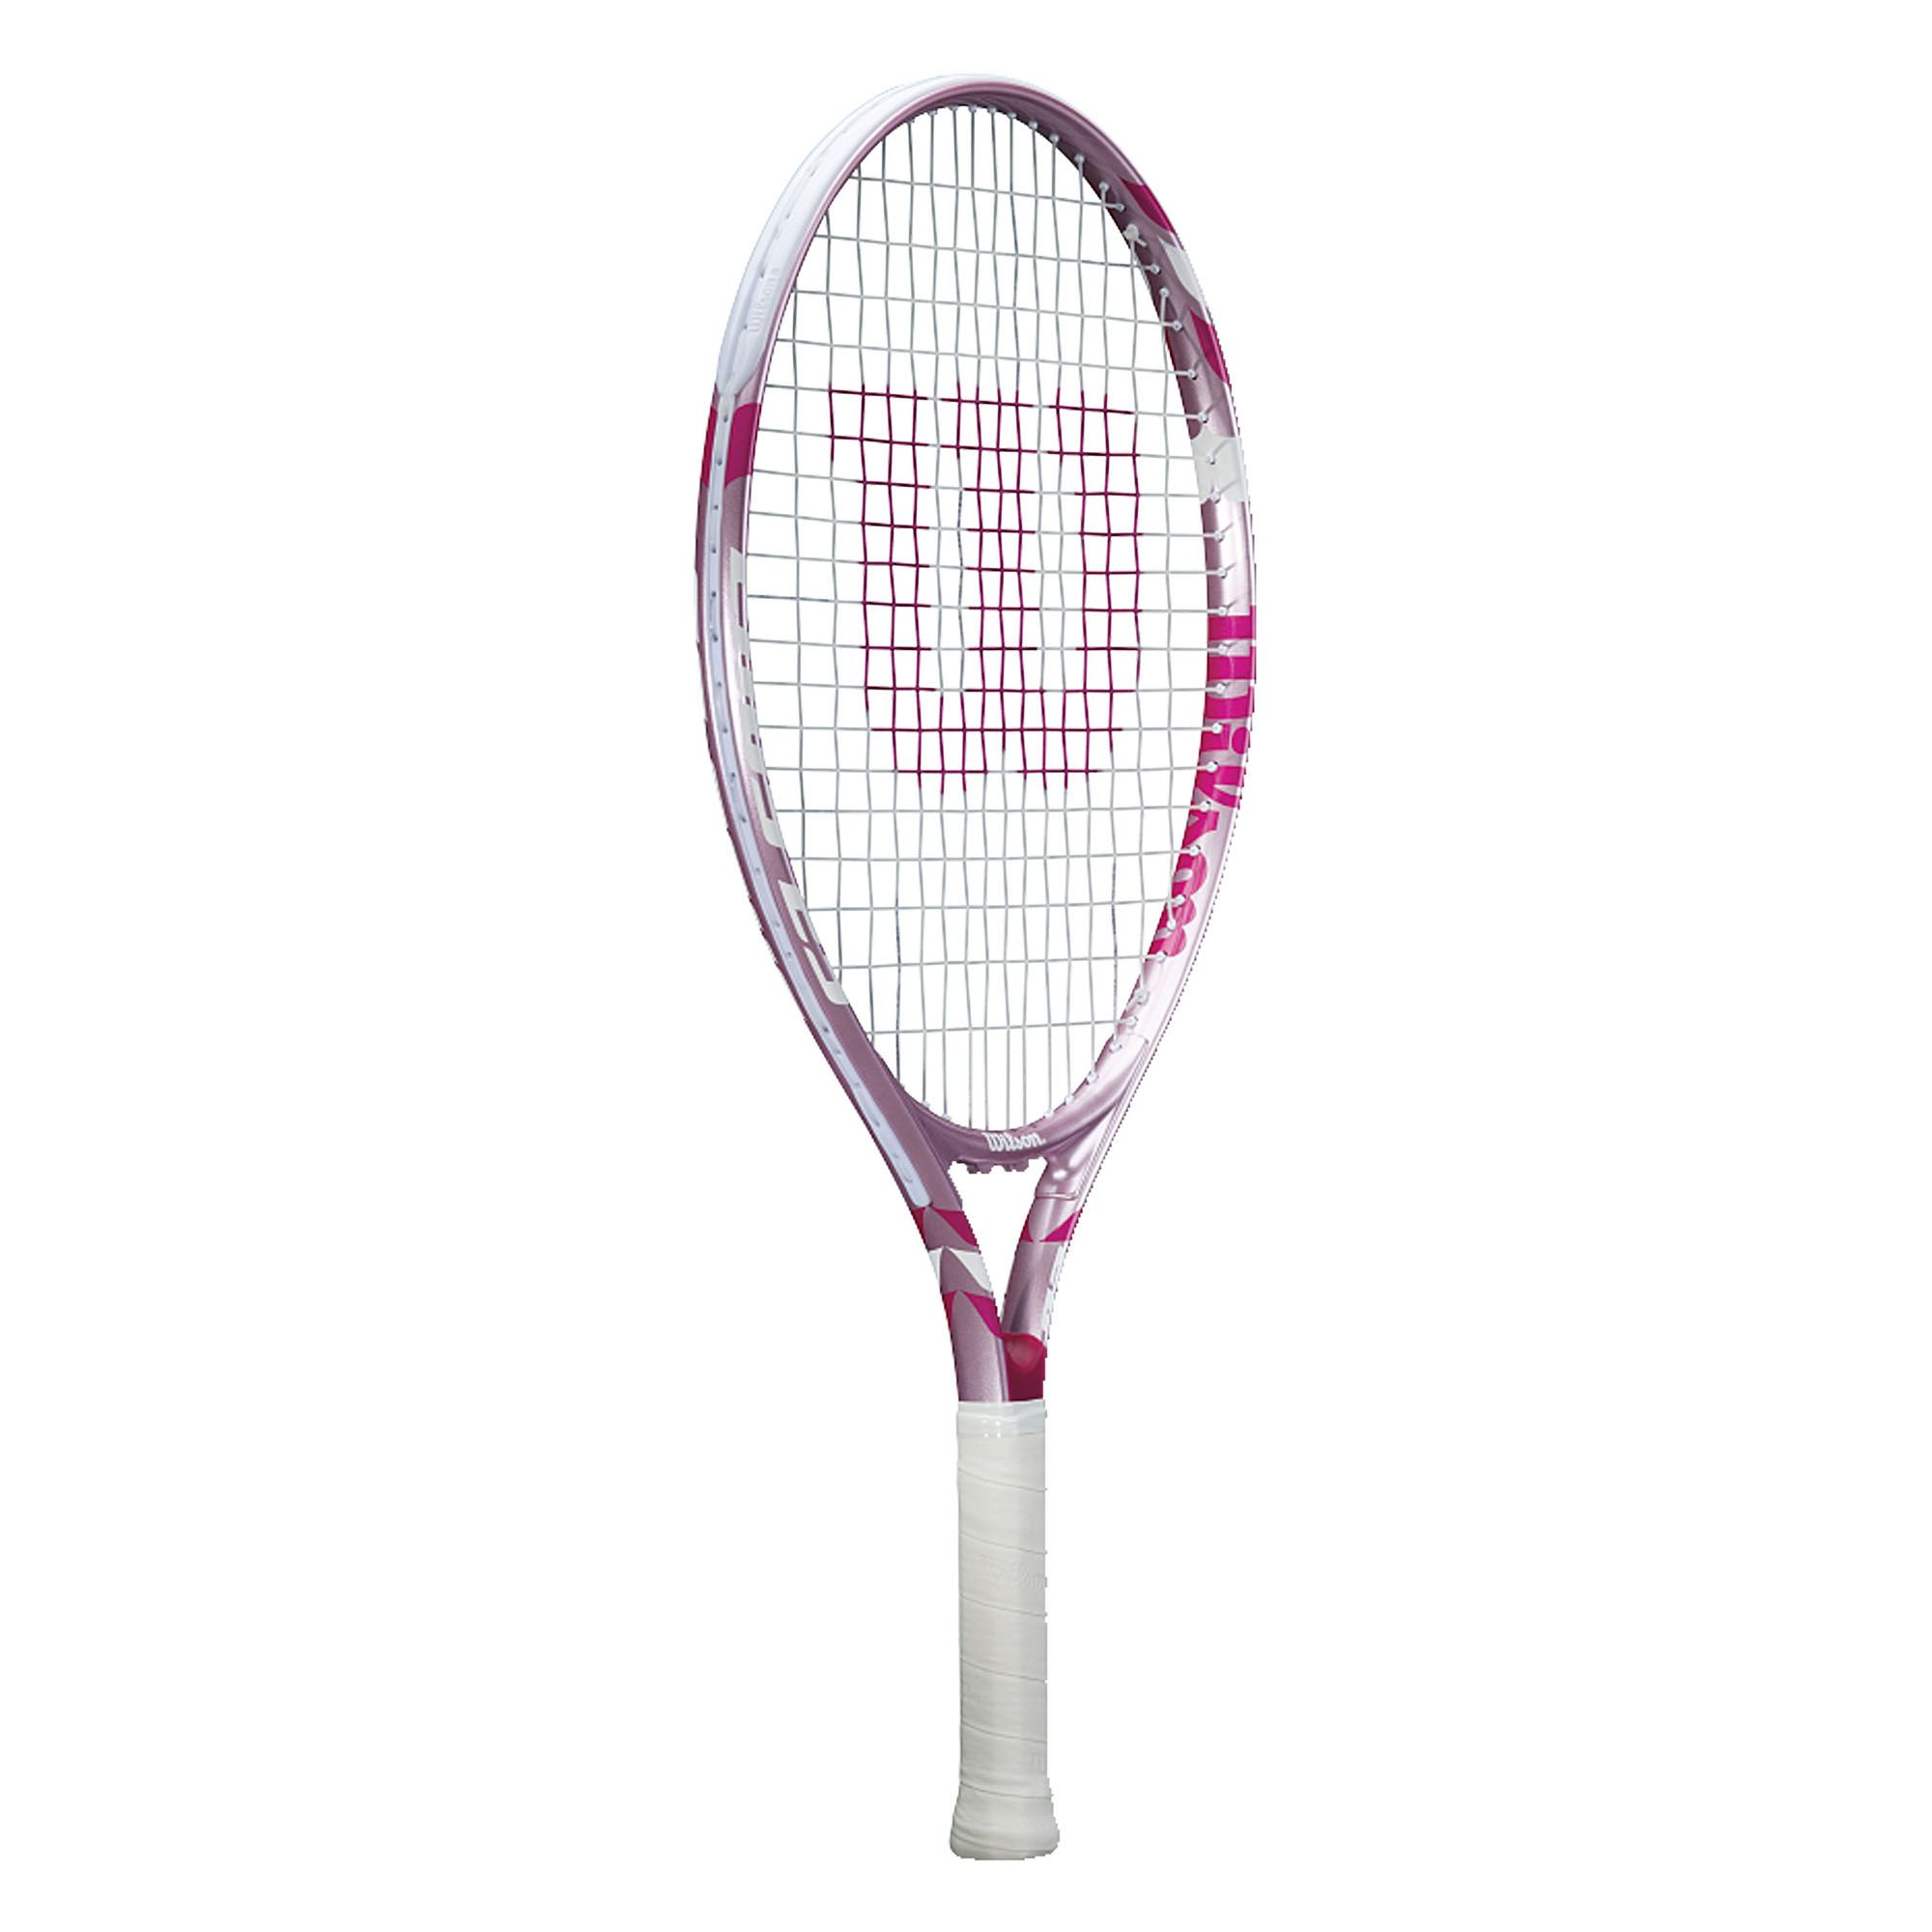 Wilson Envy Junior Pink 23 Tennis Racket - Sweatband.com